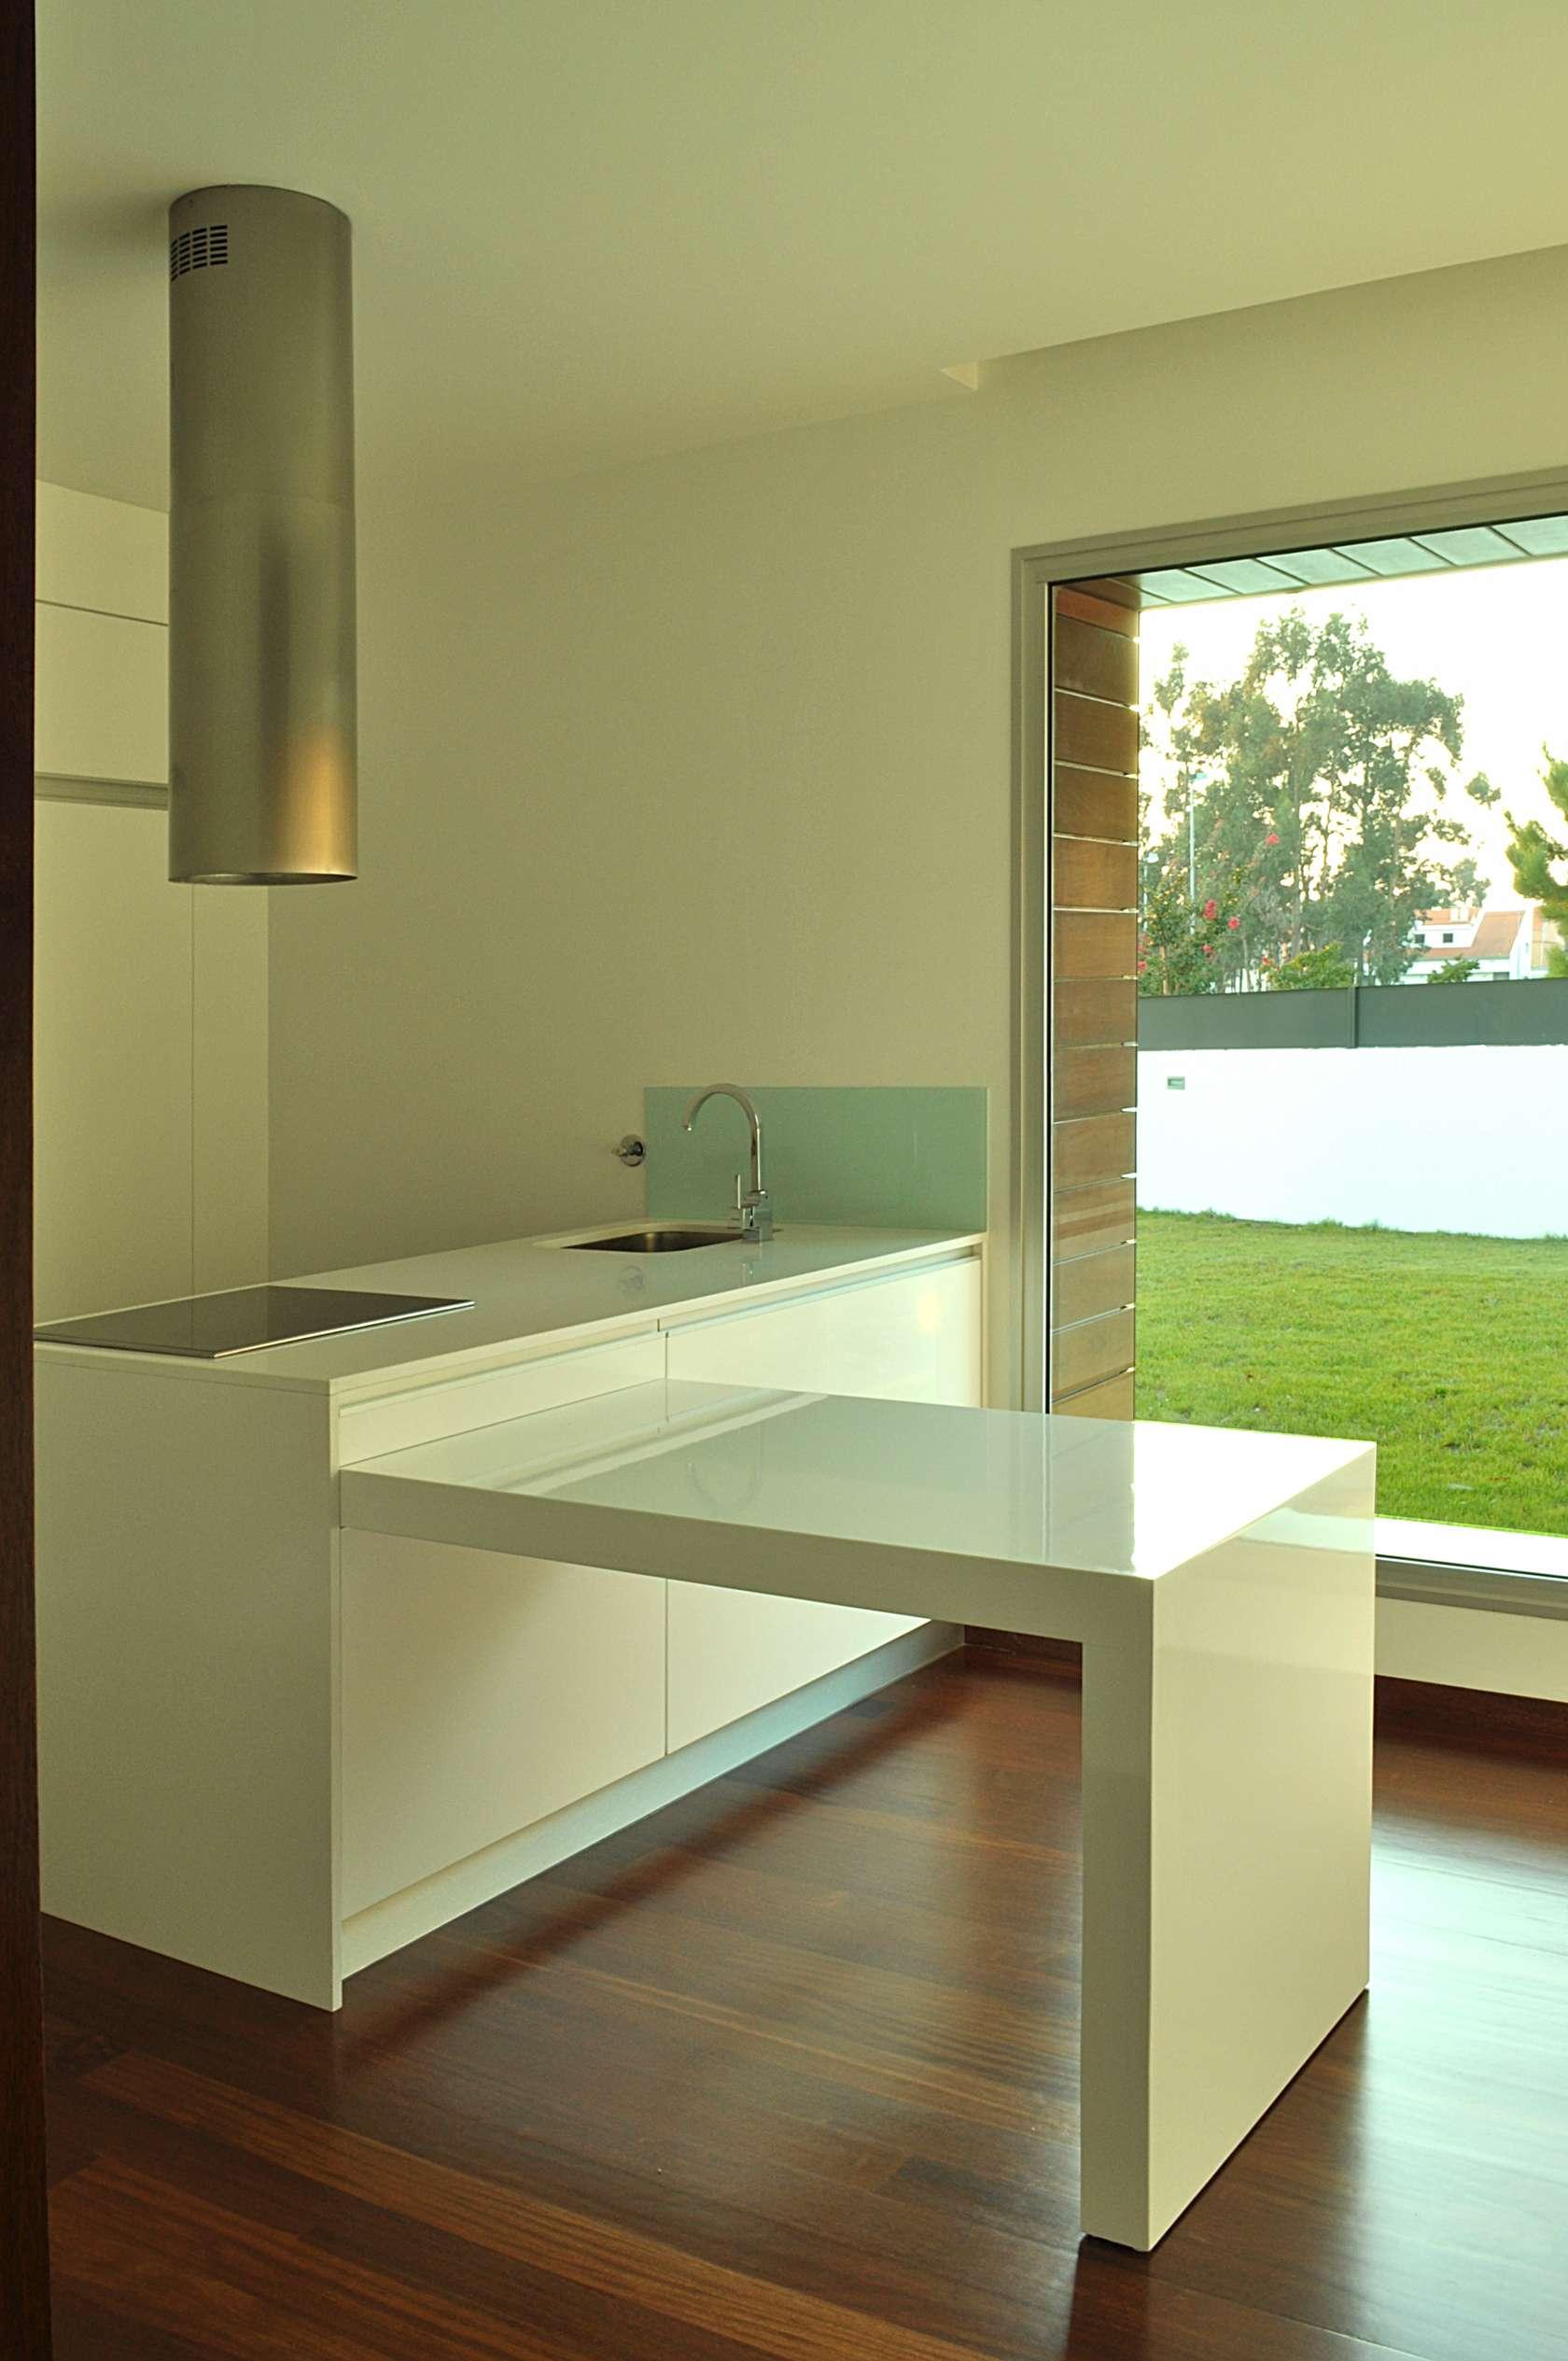 Dise o de casa cuadrada de dos pisos con planos y fachadas for Diseno de cocinas pequenas cuadradas